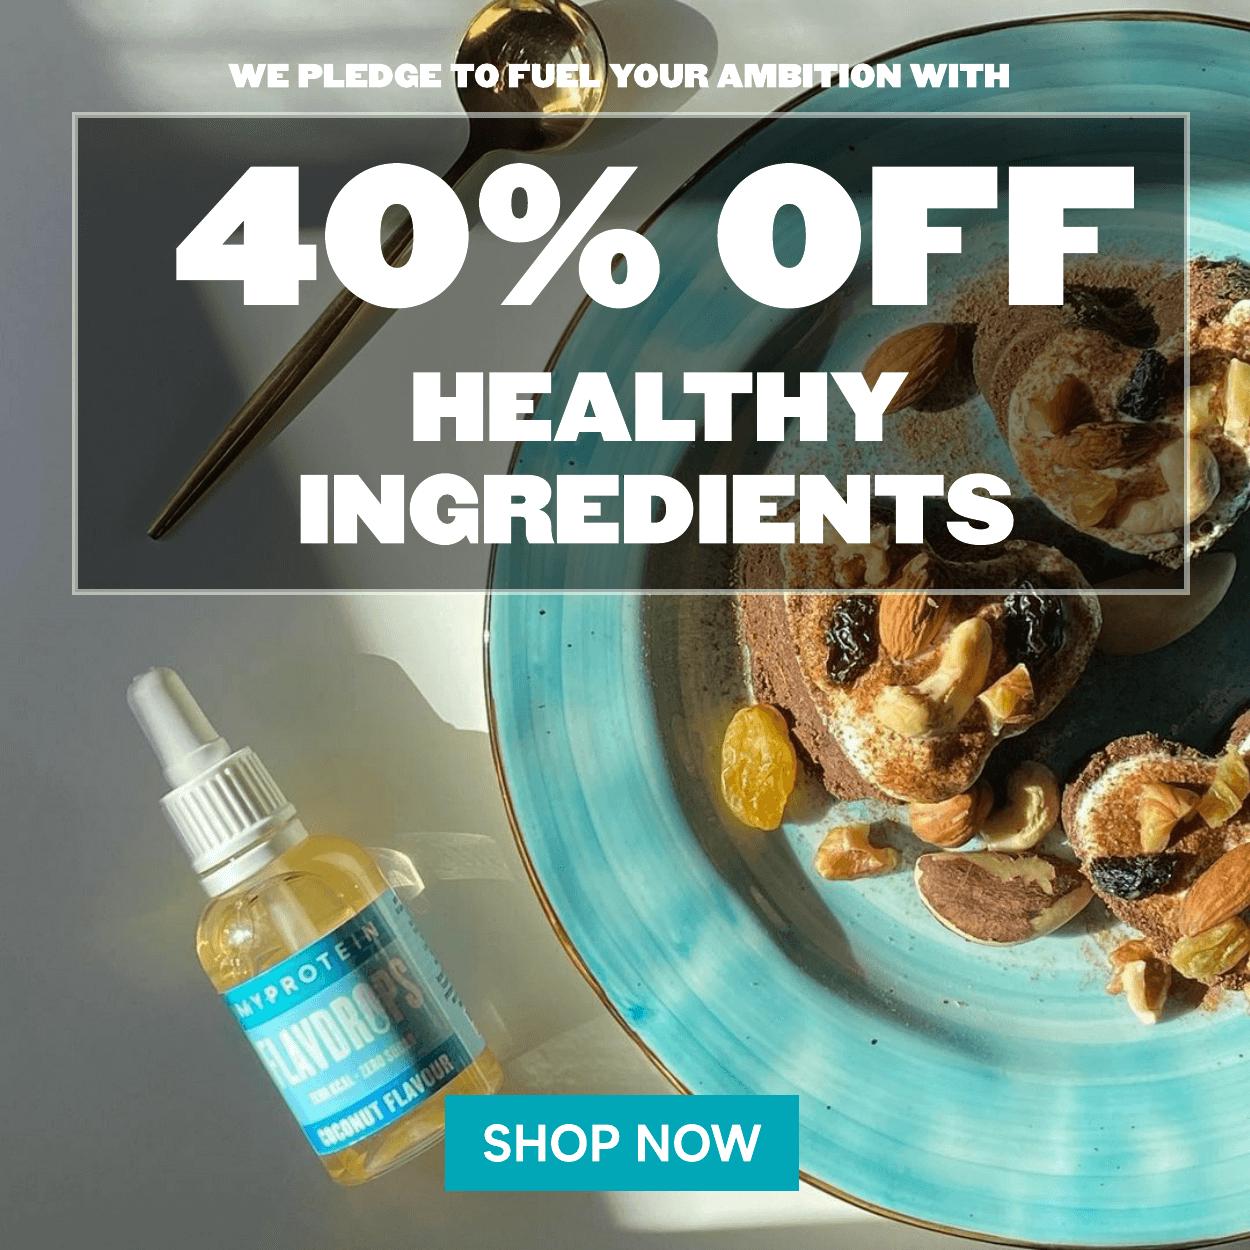 40% off healthy ingredients